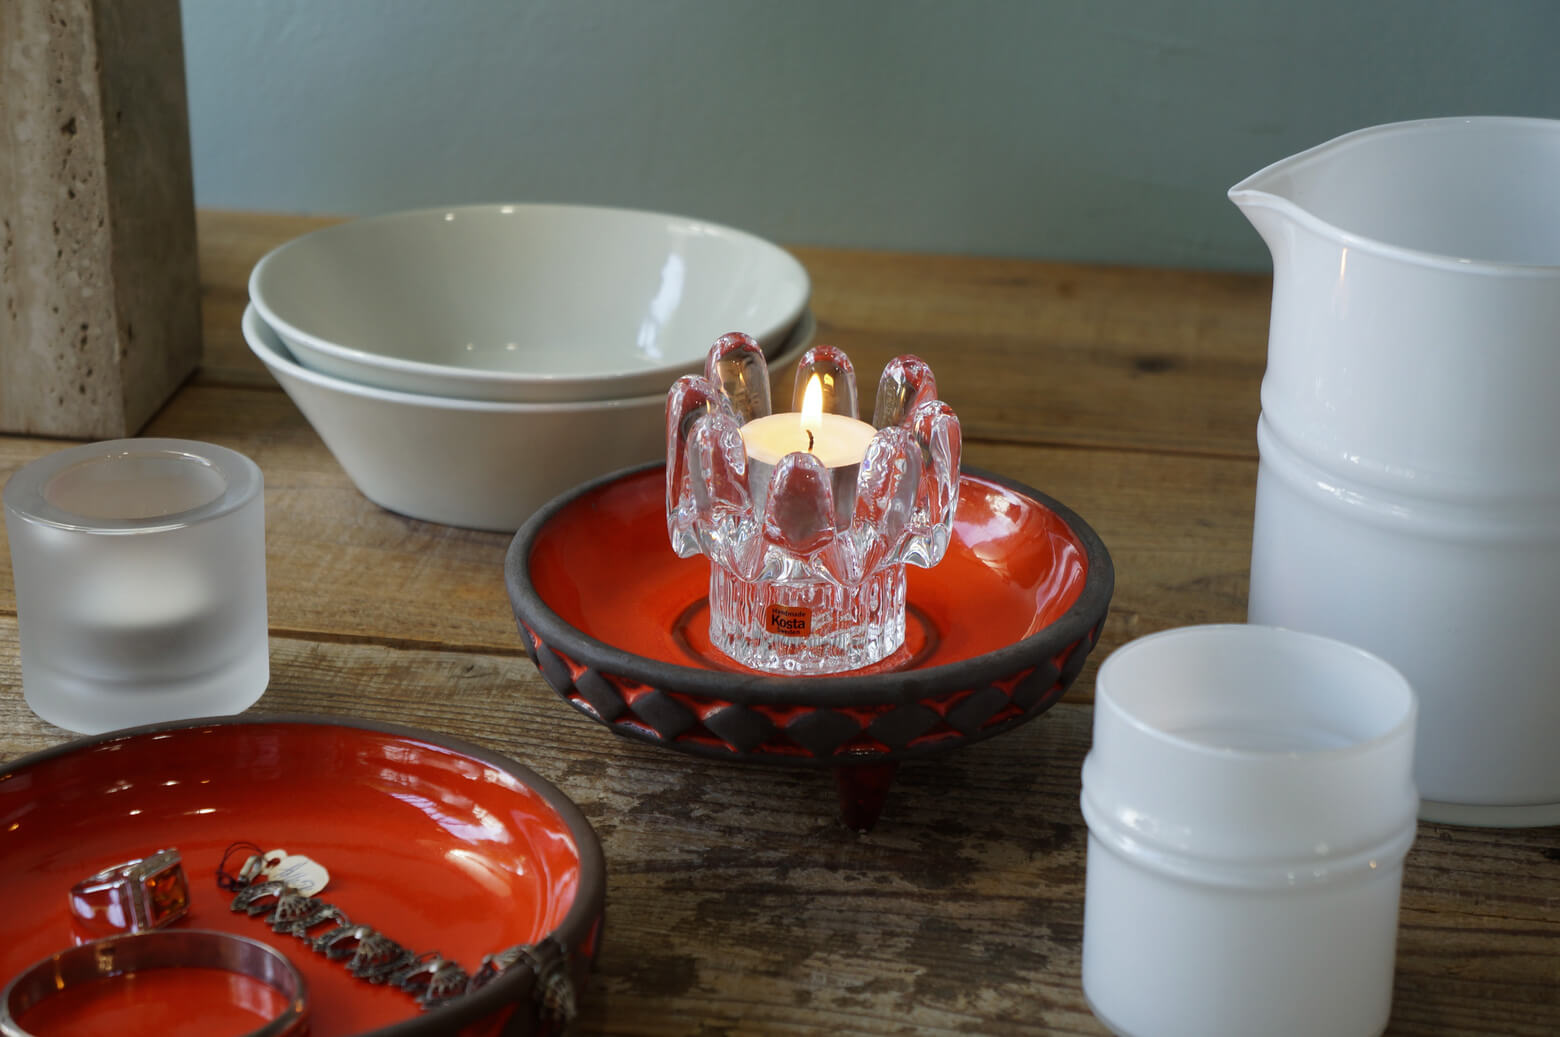 Frank Keramik Denmark orange pottery / フランク ケラミック デンマークヴィンテージ 陶器